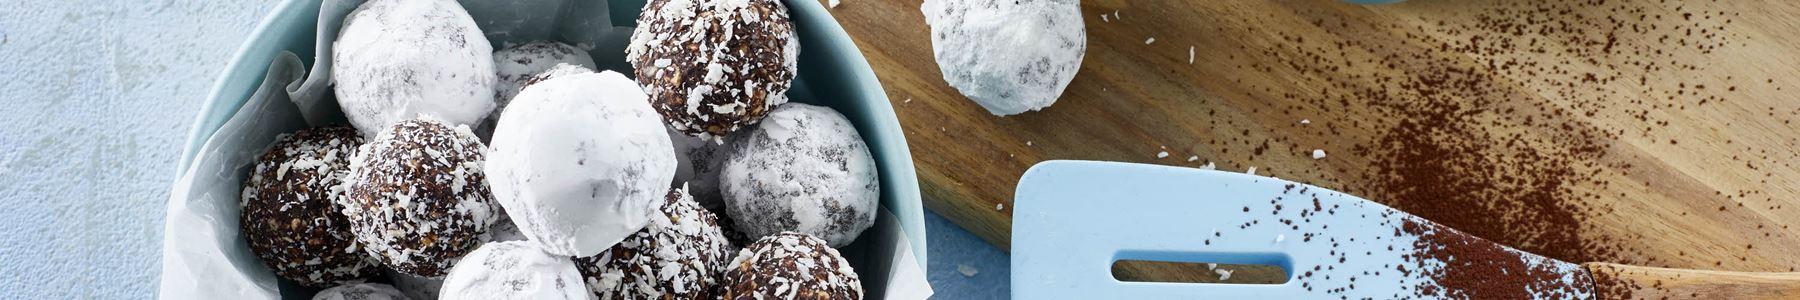 Kager + Desserter + Havregryn + Vinter